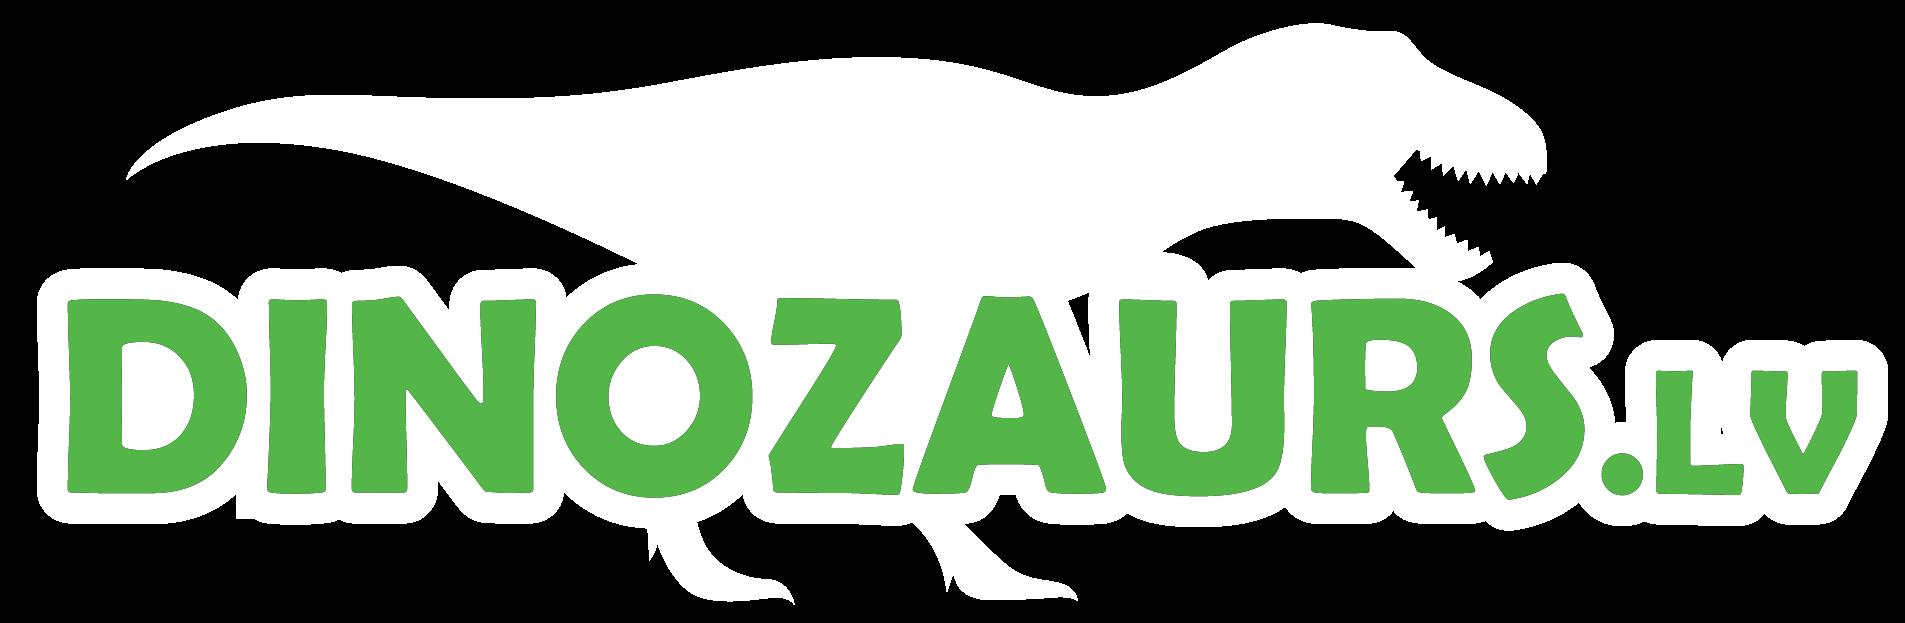 rsz_p_dinozaurslv-01